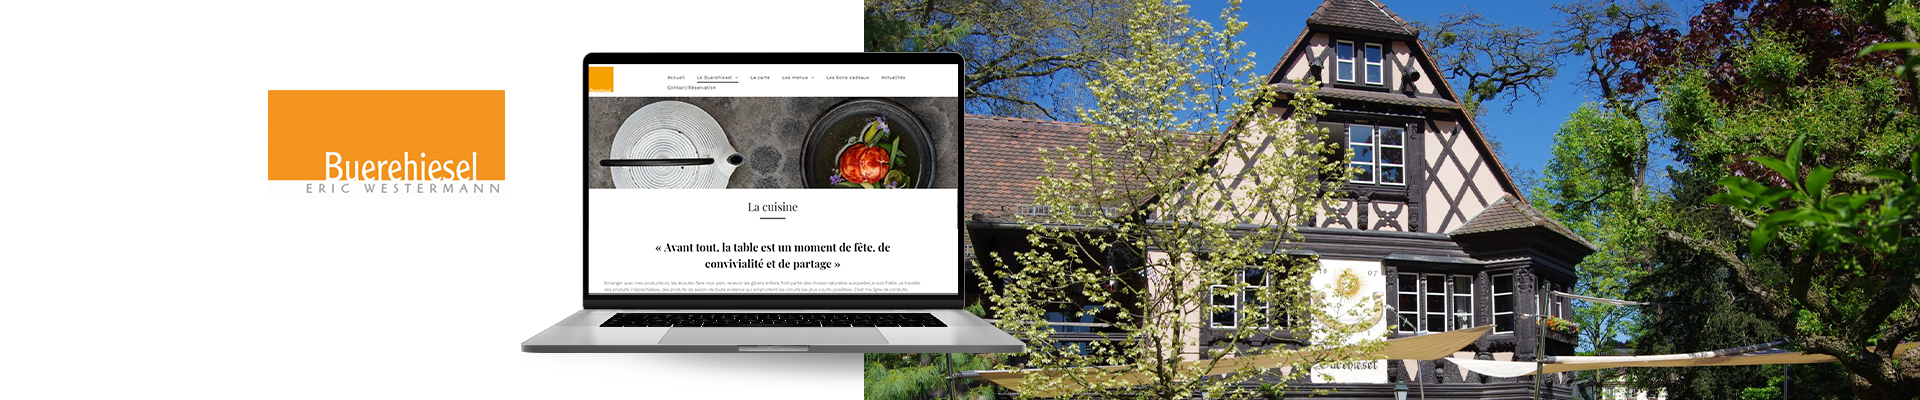 création site internet restaurant buerehiesel